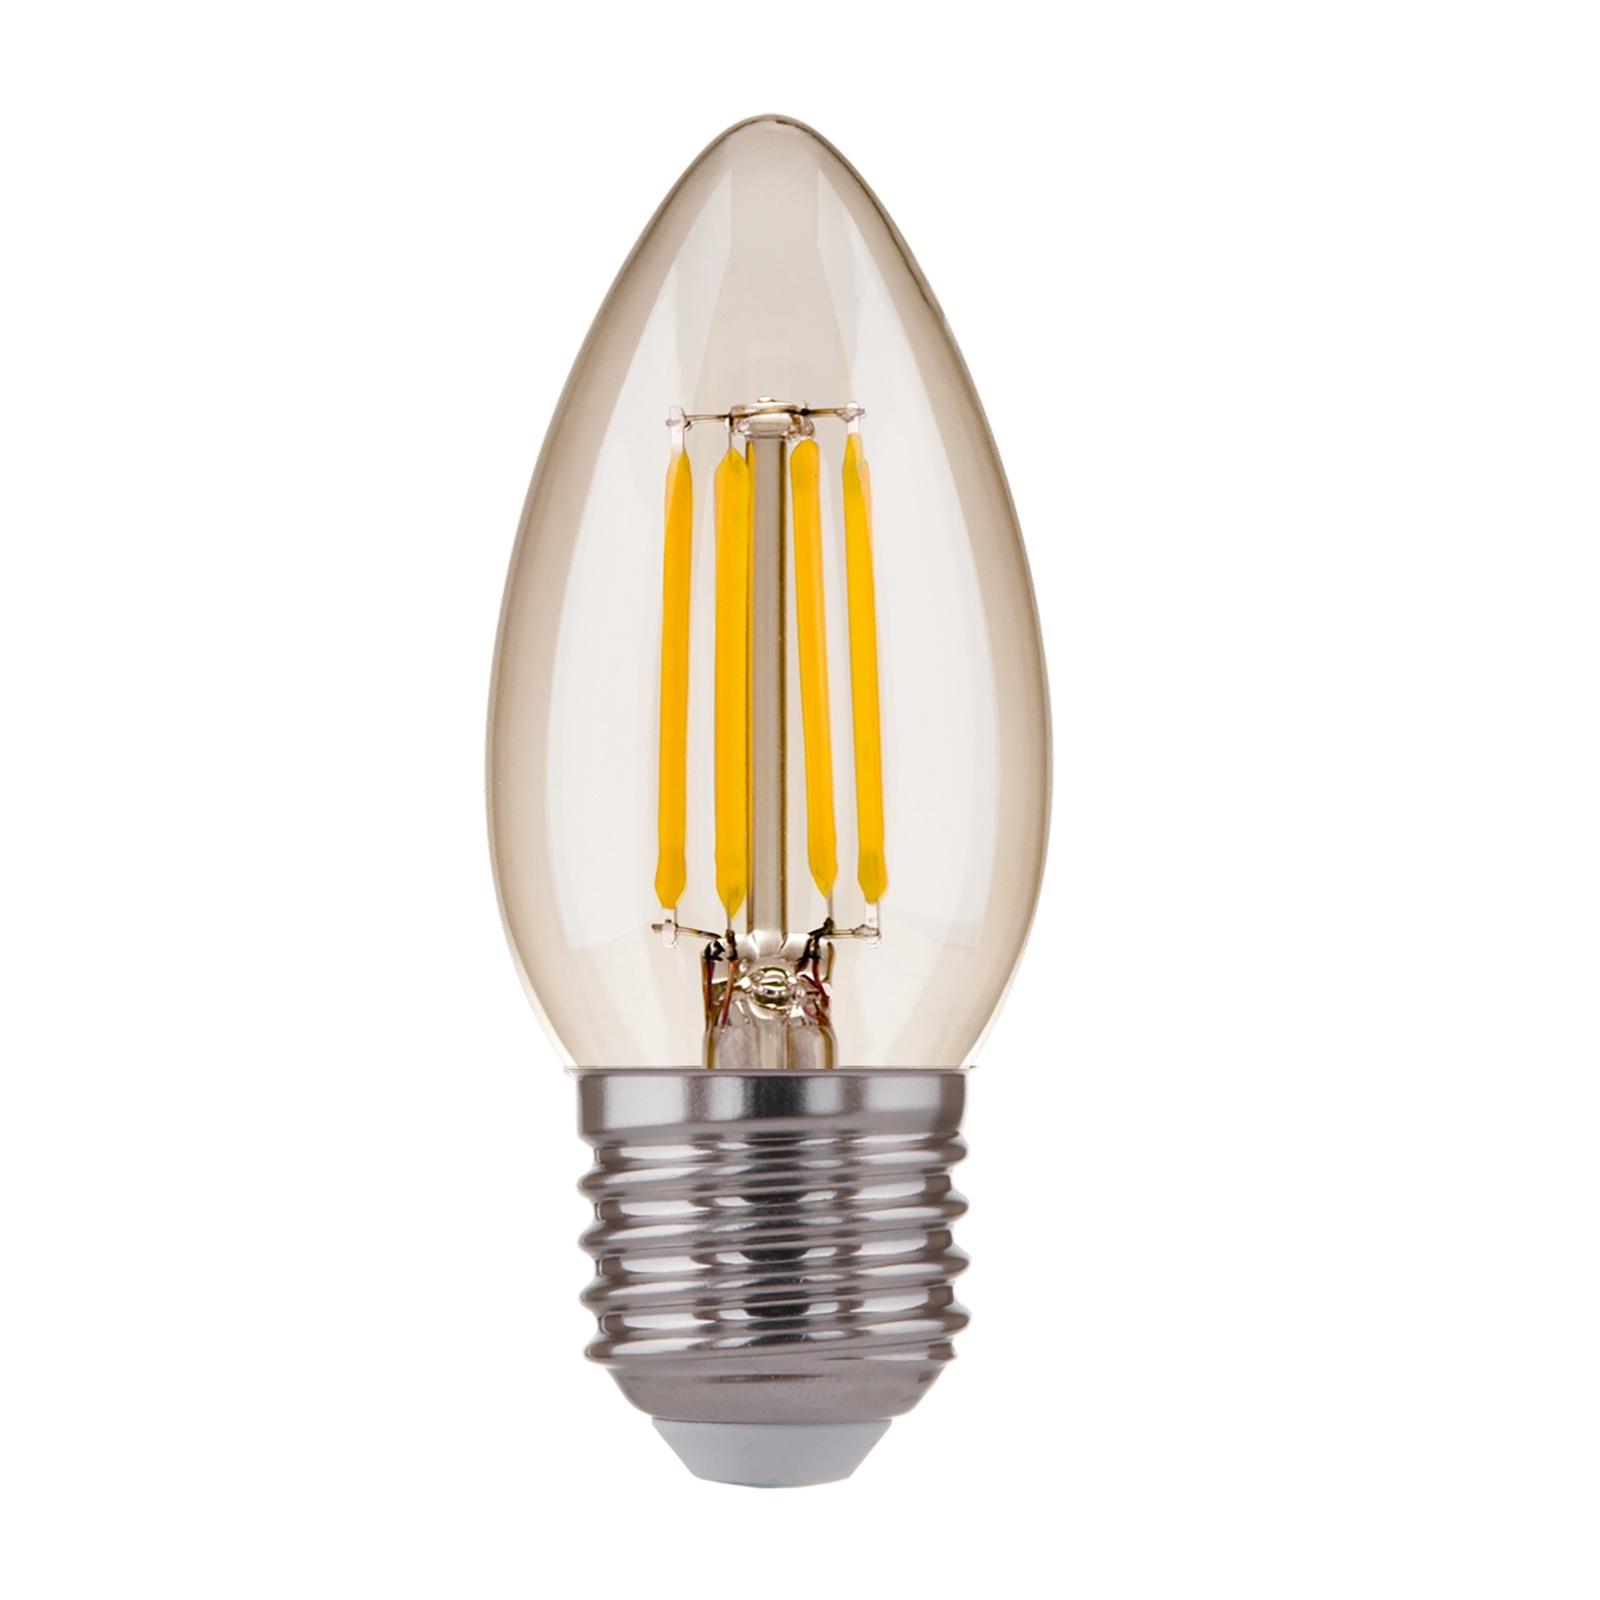 Лампочка Elektrostandard светодиодная Свеча CD F 7W 3300K E27, Теплый свет 7 Вт, Светодиодная